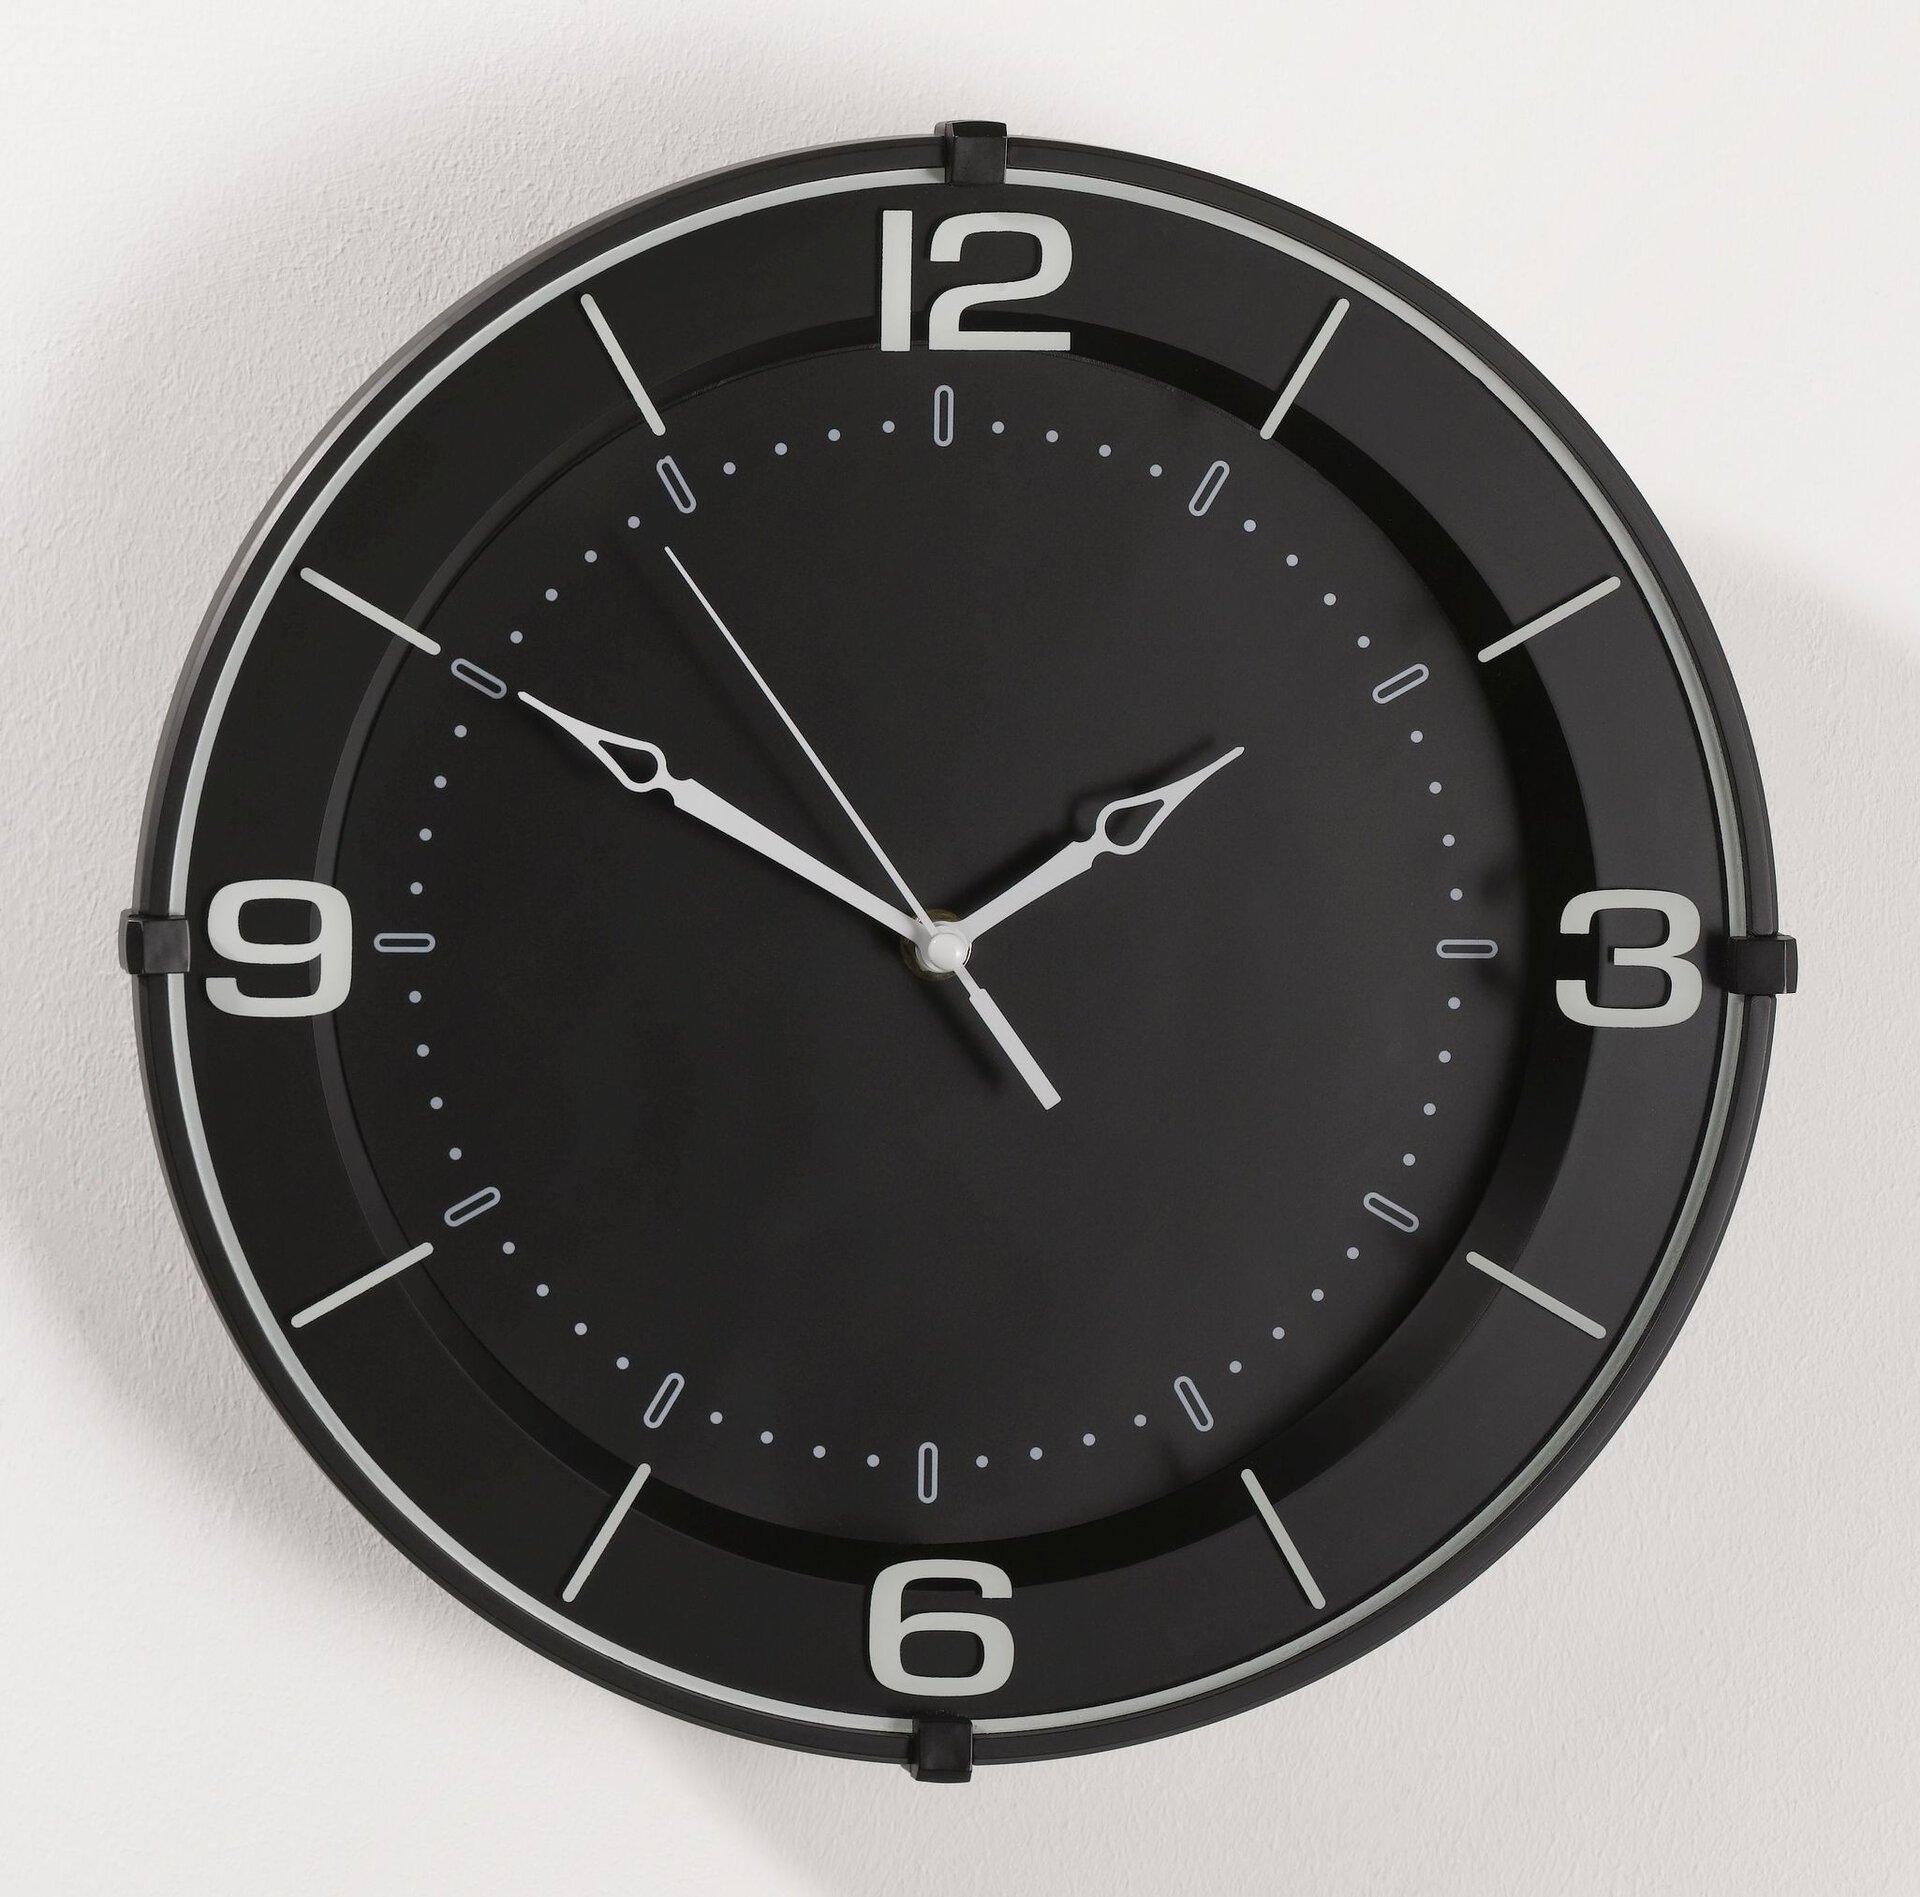 Uhr 185027 Casa Nova Metall 5 x